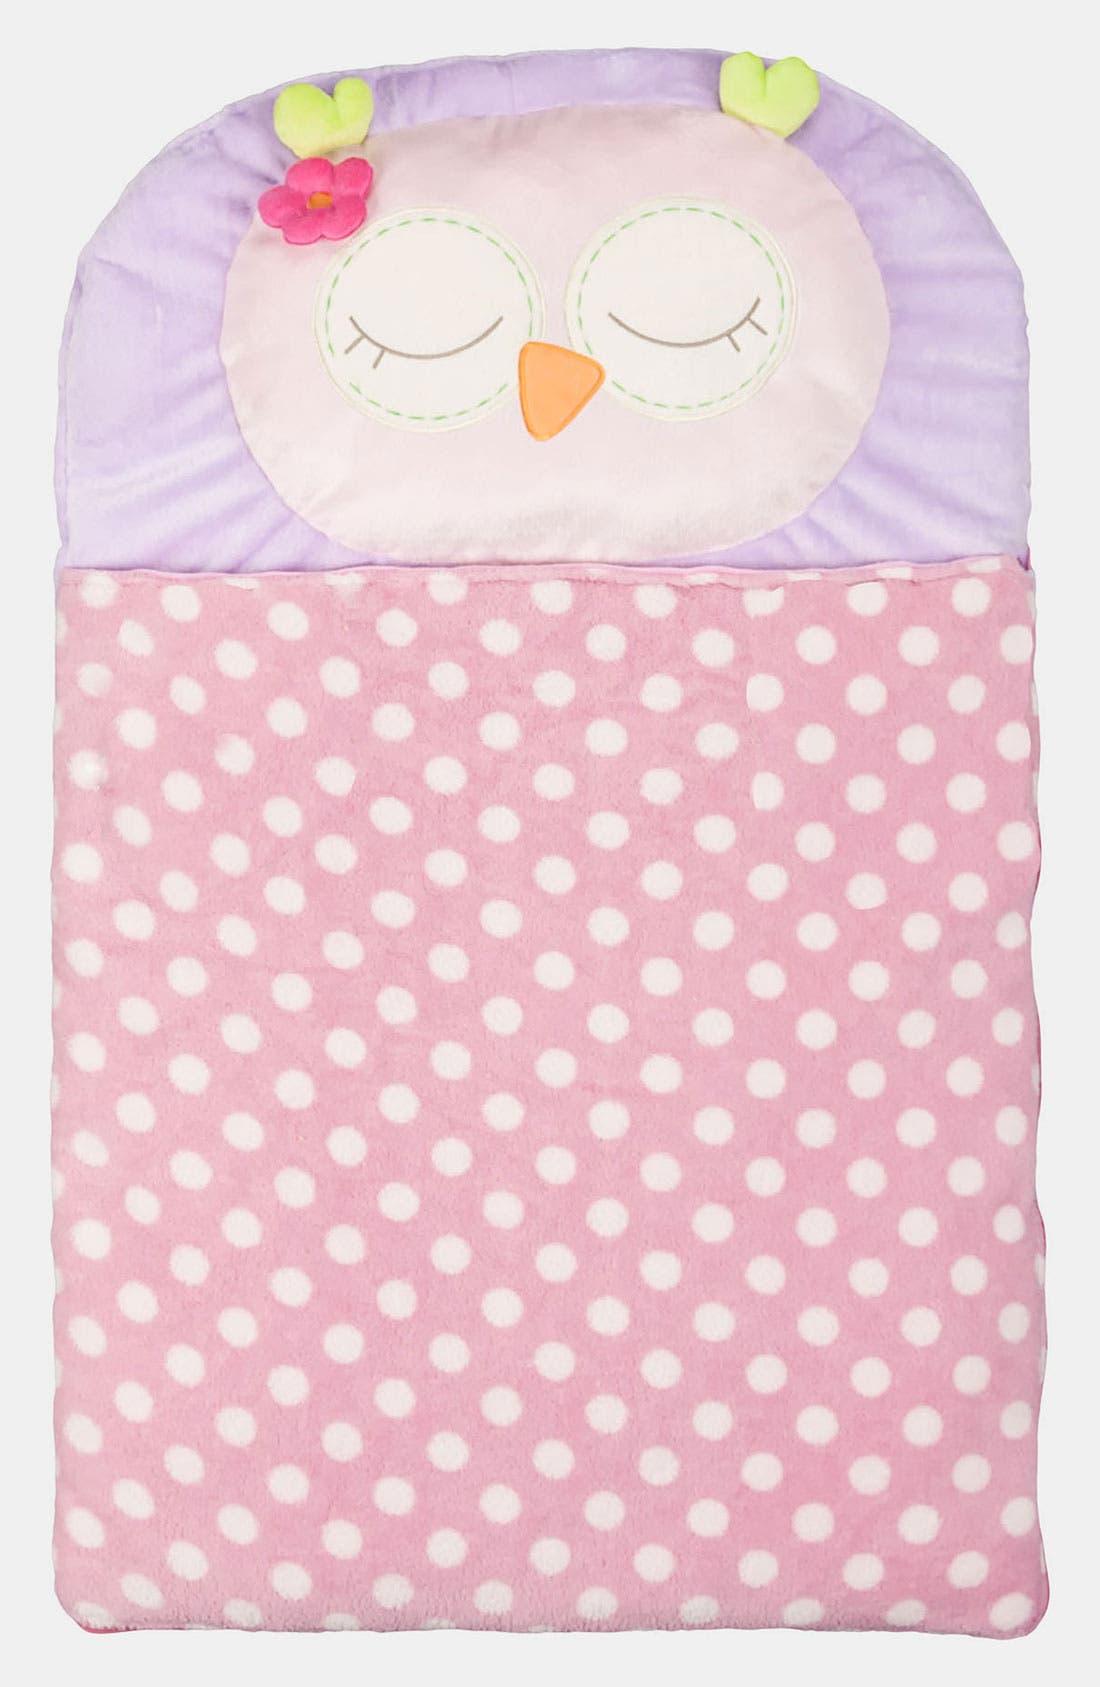 Alternate Image 1 Selected - Living Textiles Slumber Bag (Toddler)